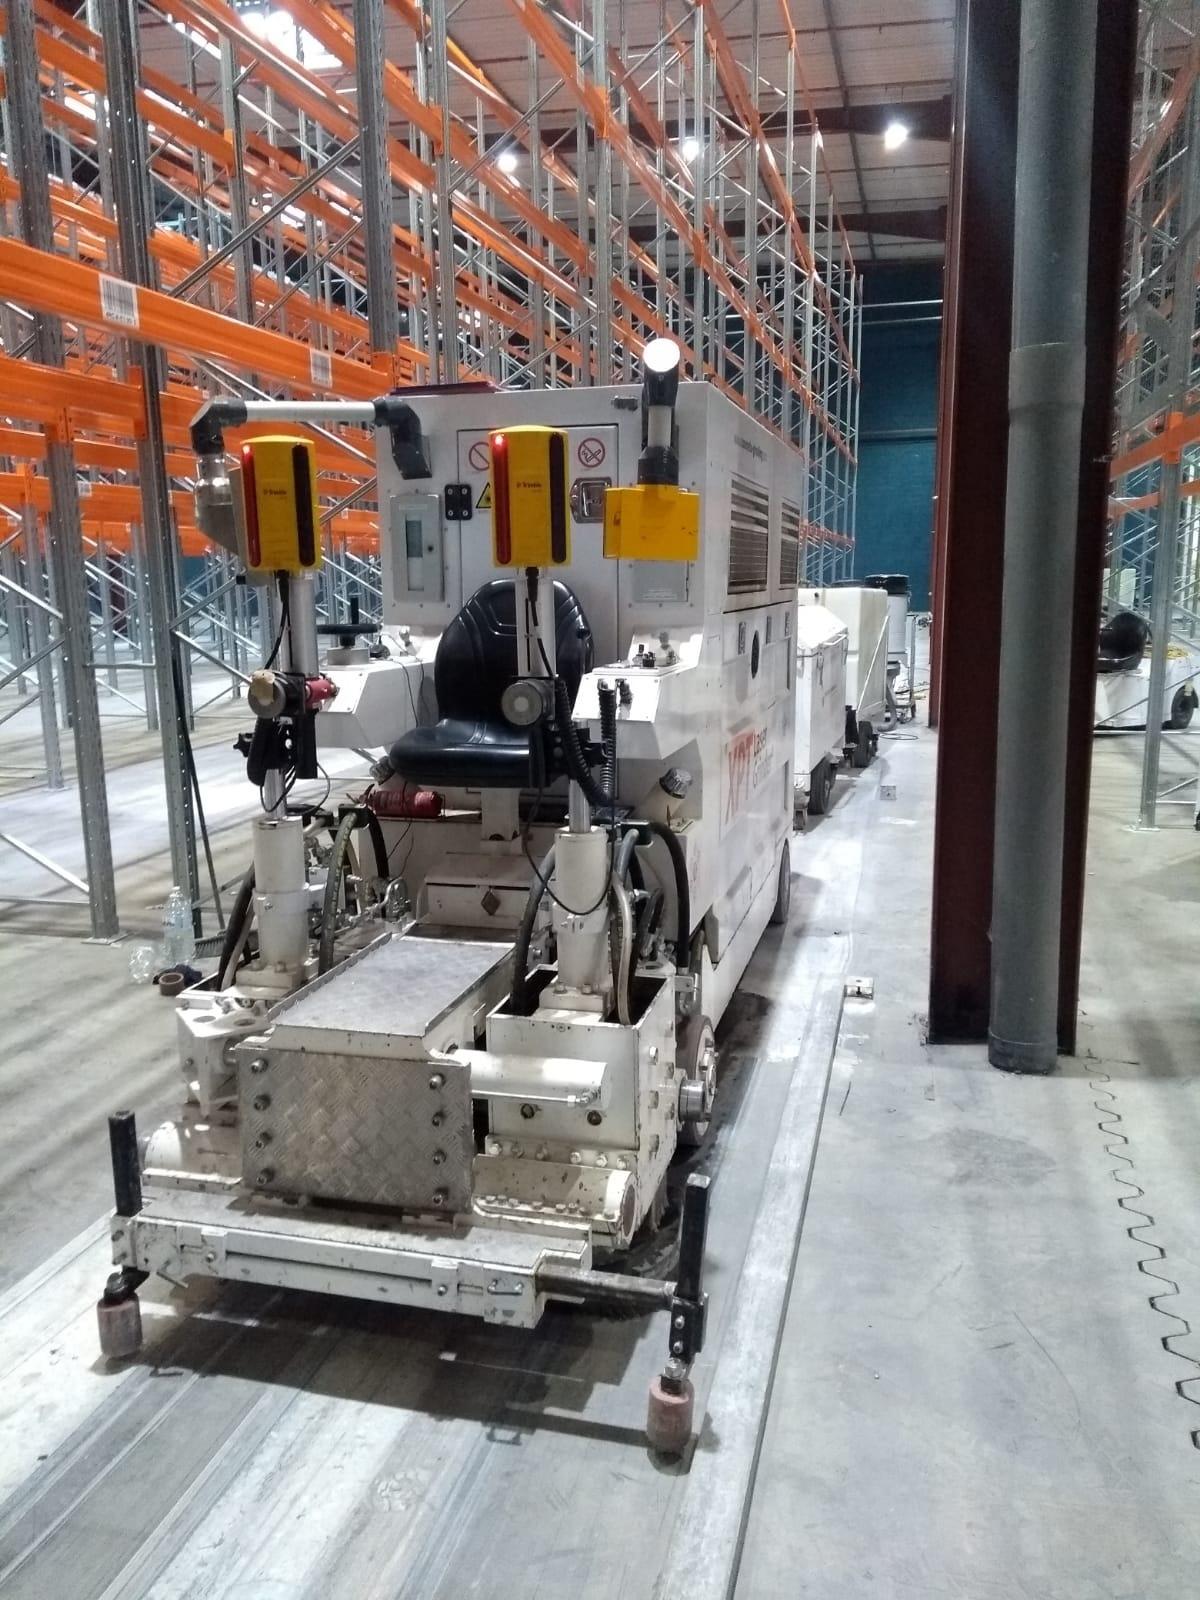 Laser grinding allée étroite